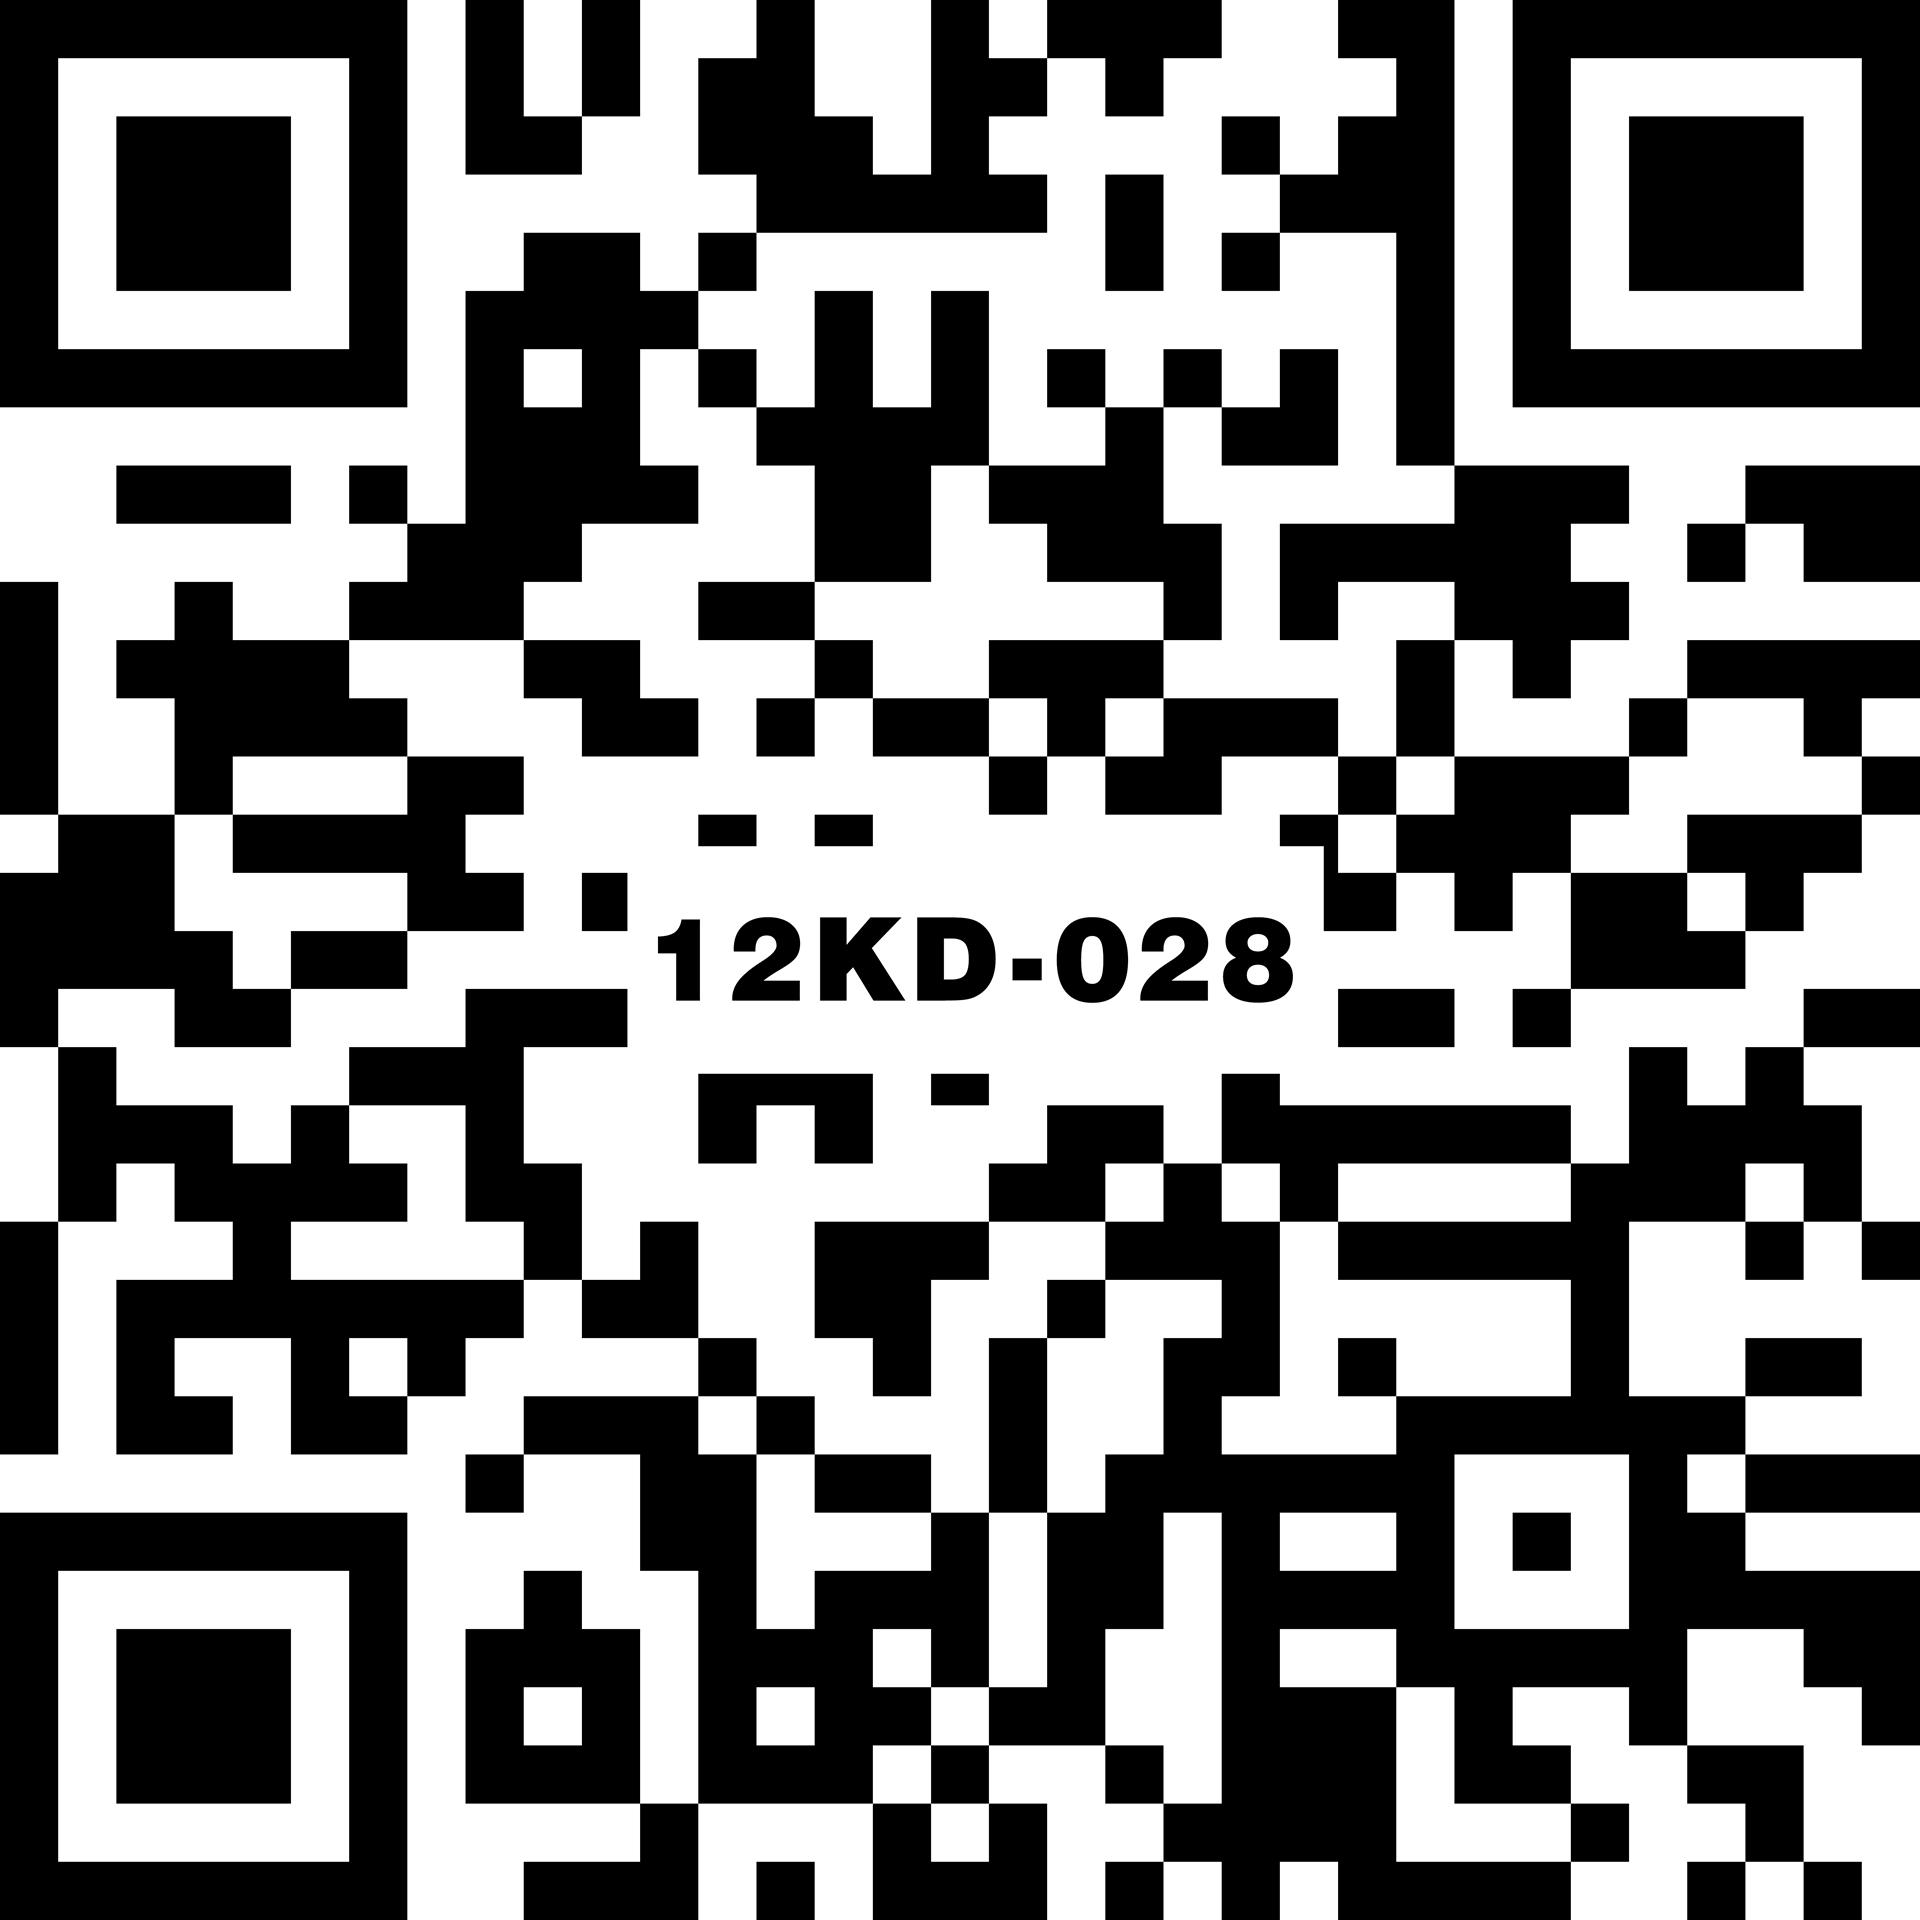 12KD-028